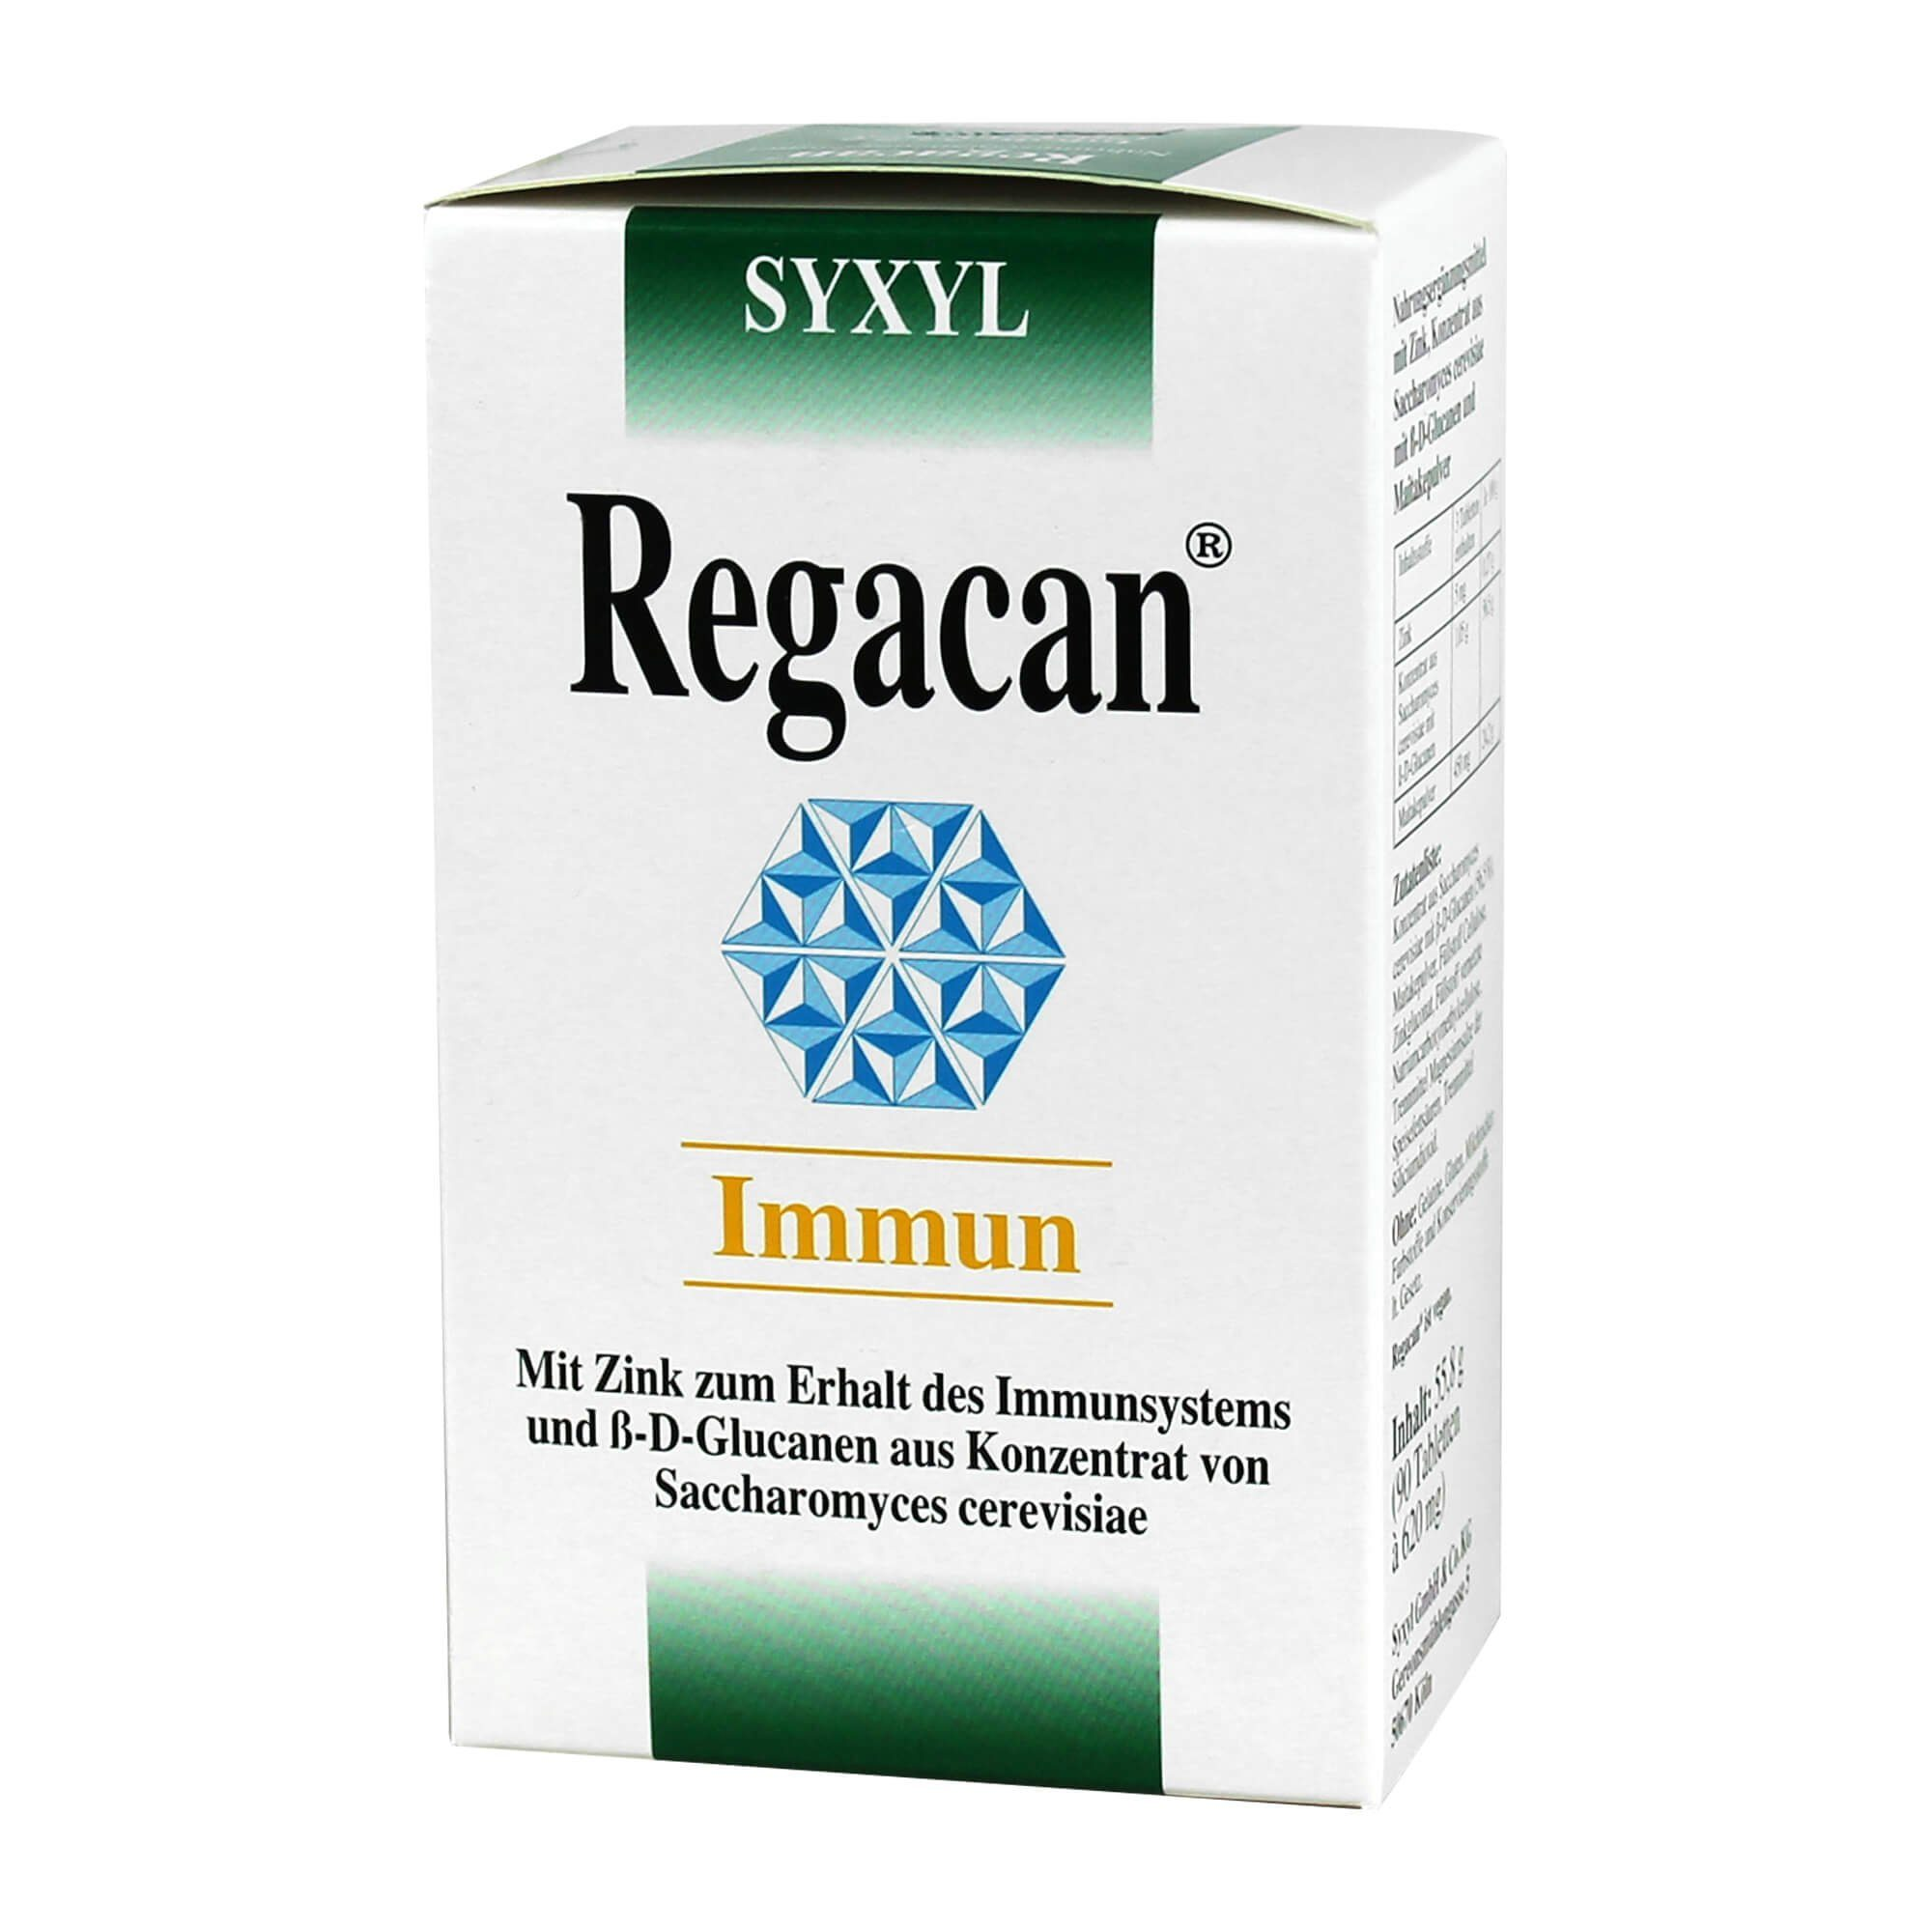 Regacan Syxyl, 90 St